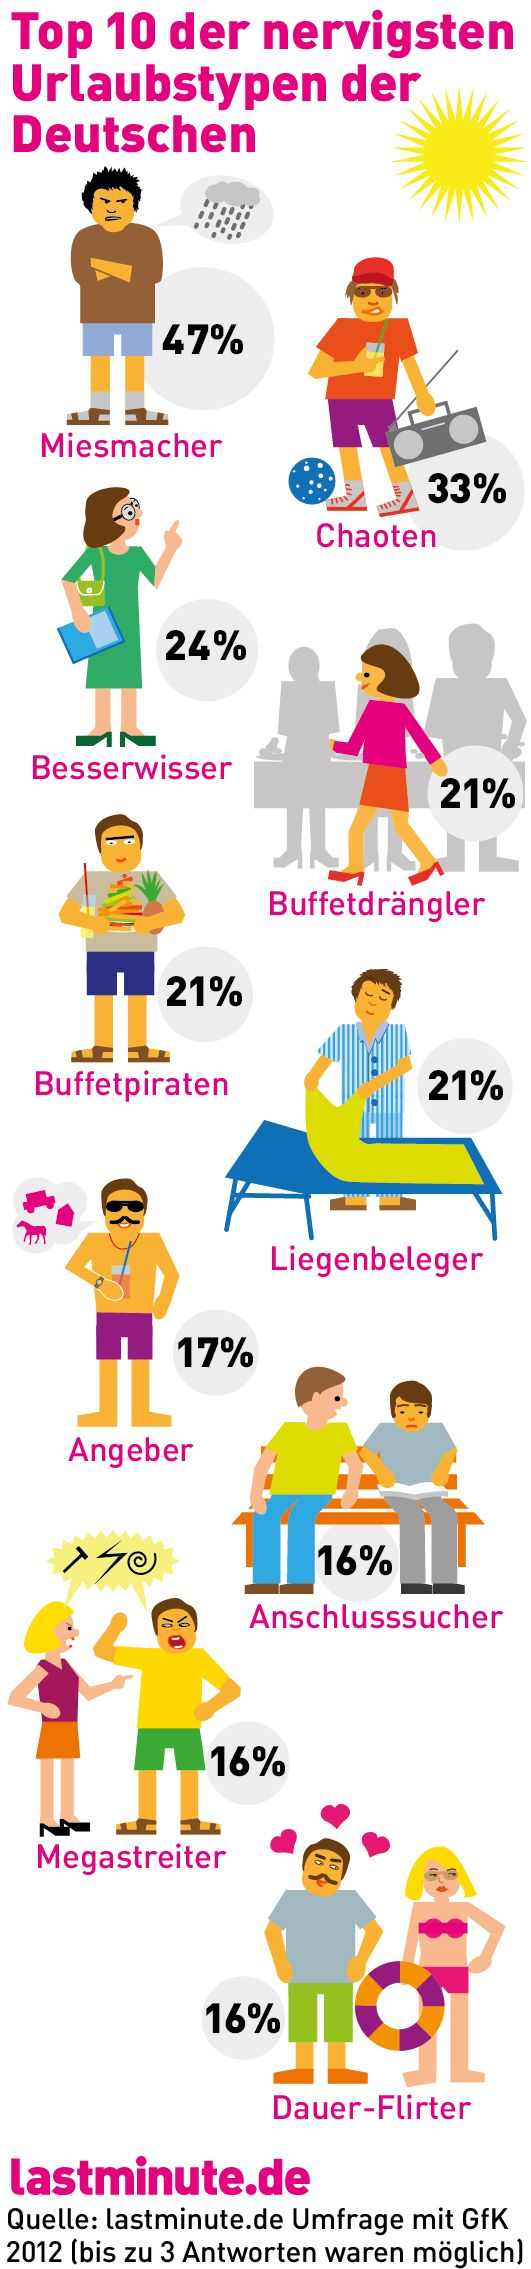 Infografik: Miesmacher, Chaoten, Besserwisser, Buffetdrängler - Top 10 der nervigsten Urlaubstypen der Deutschen laut lastminute.de-Umfrage http://blog.lastminute.de/nervigste-urlaubstypen/